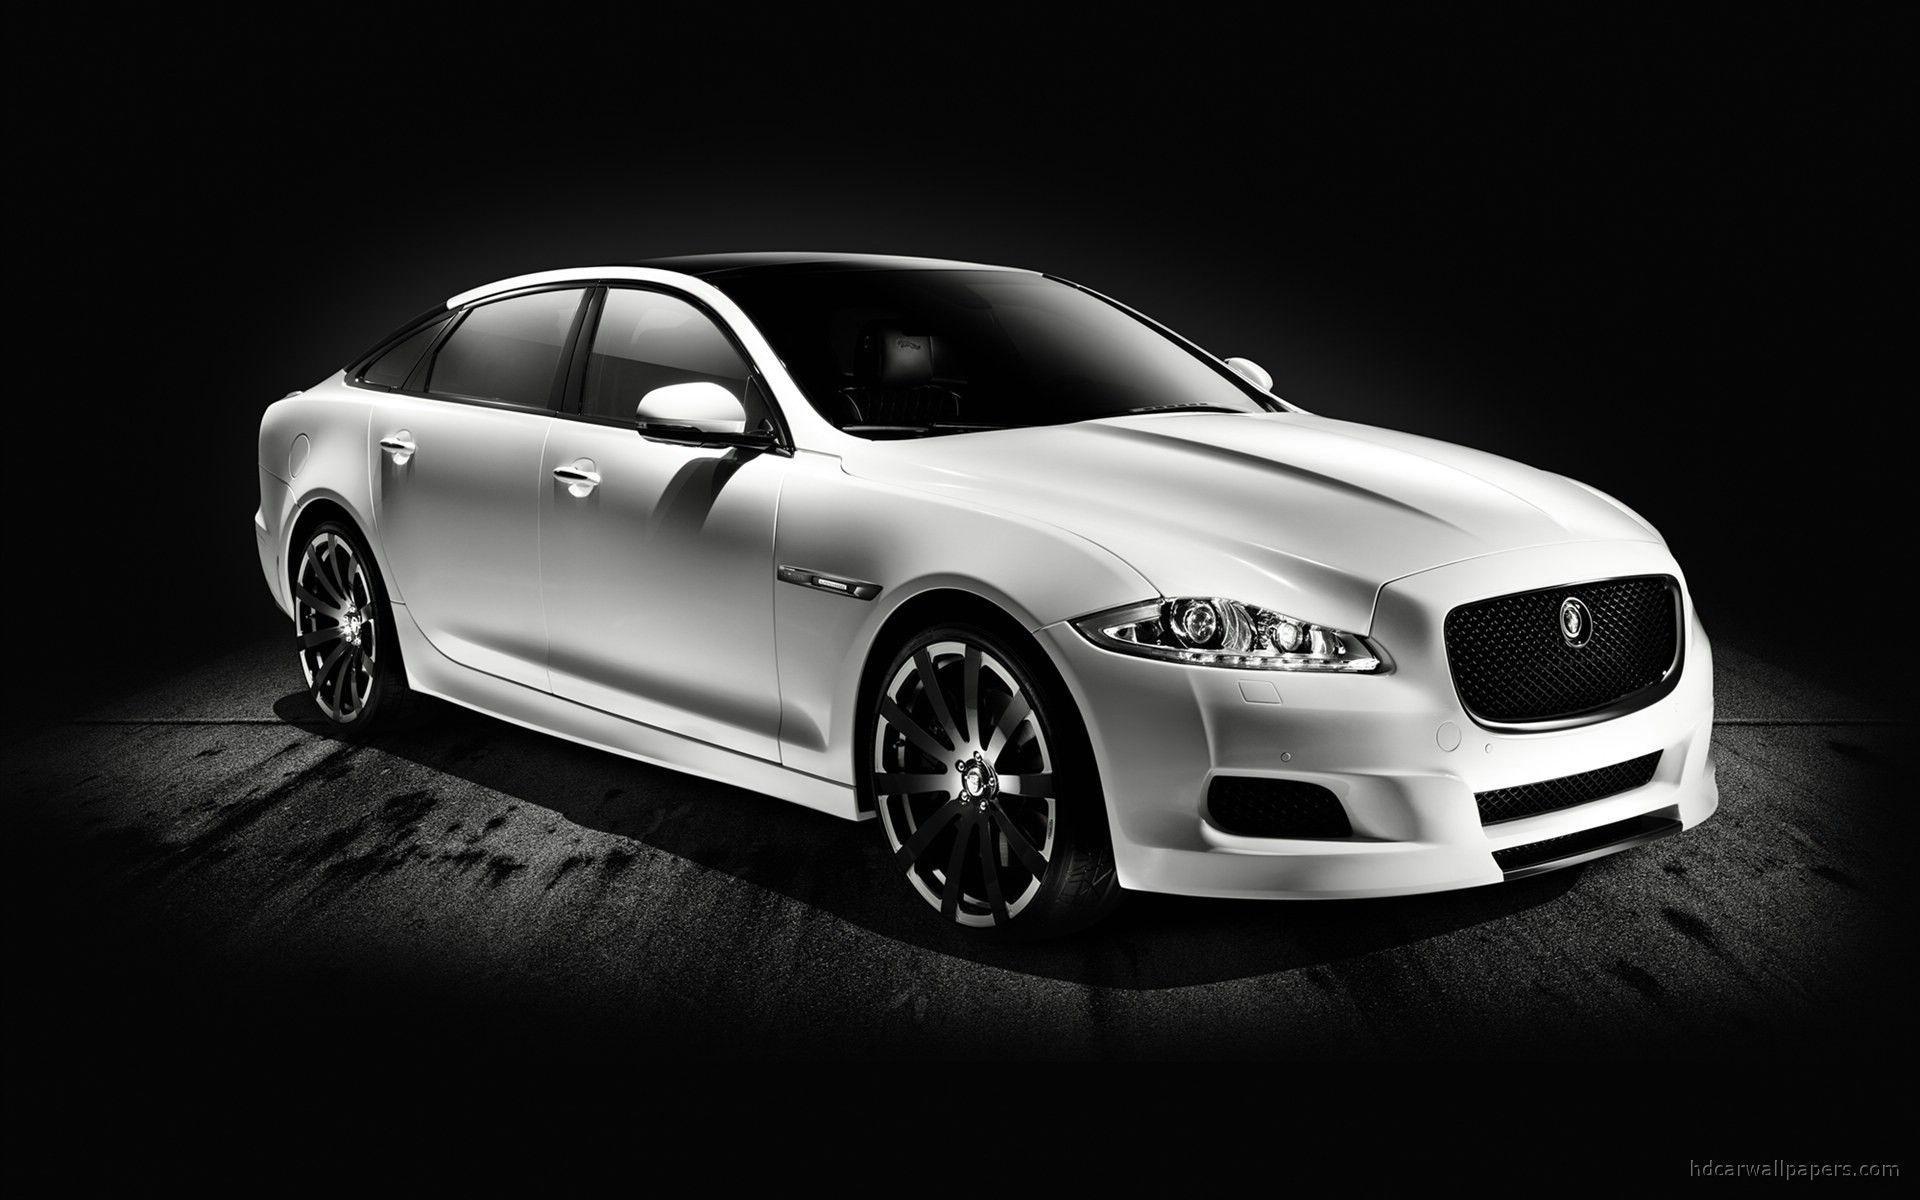 56 Best Free Jaguar Car Hd Wallpapers Wallpaperaccess